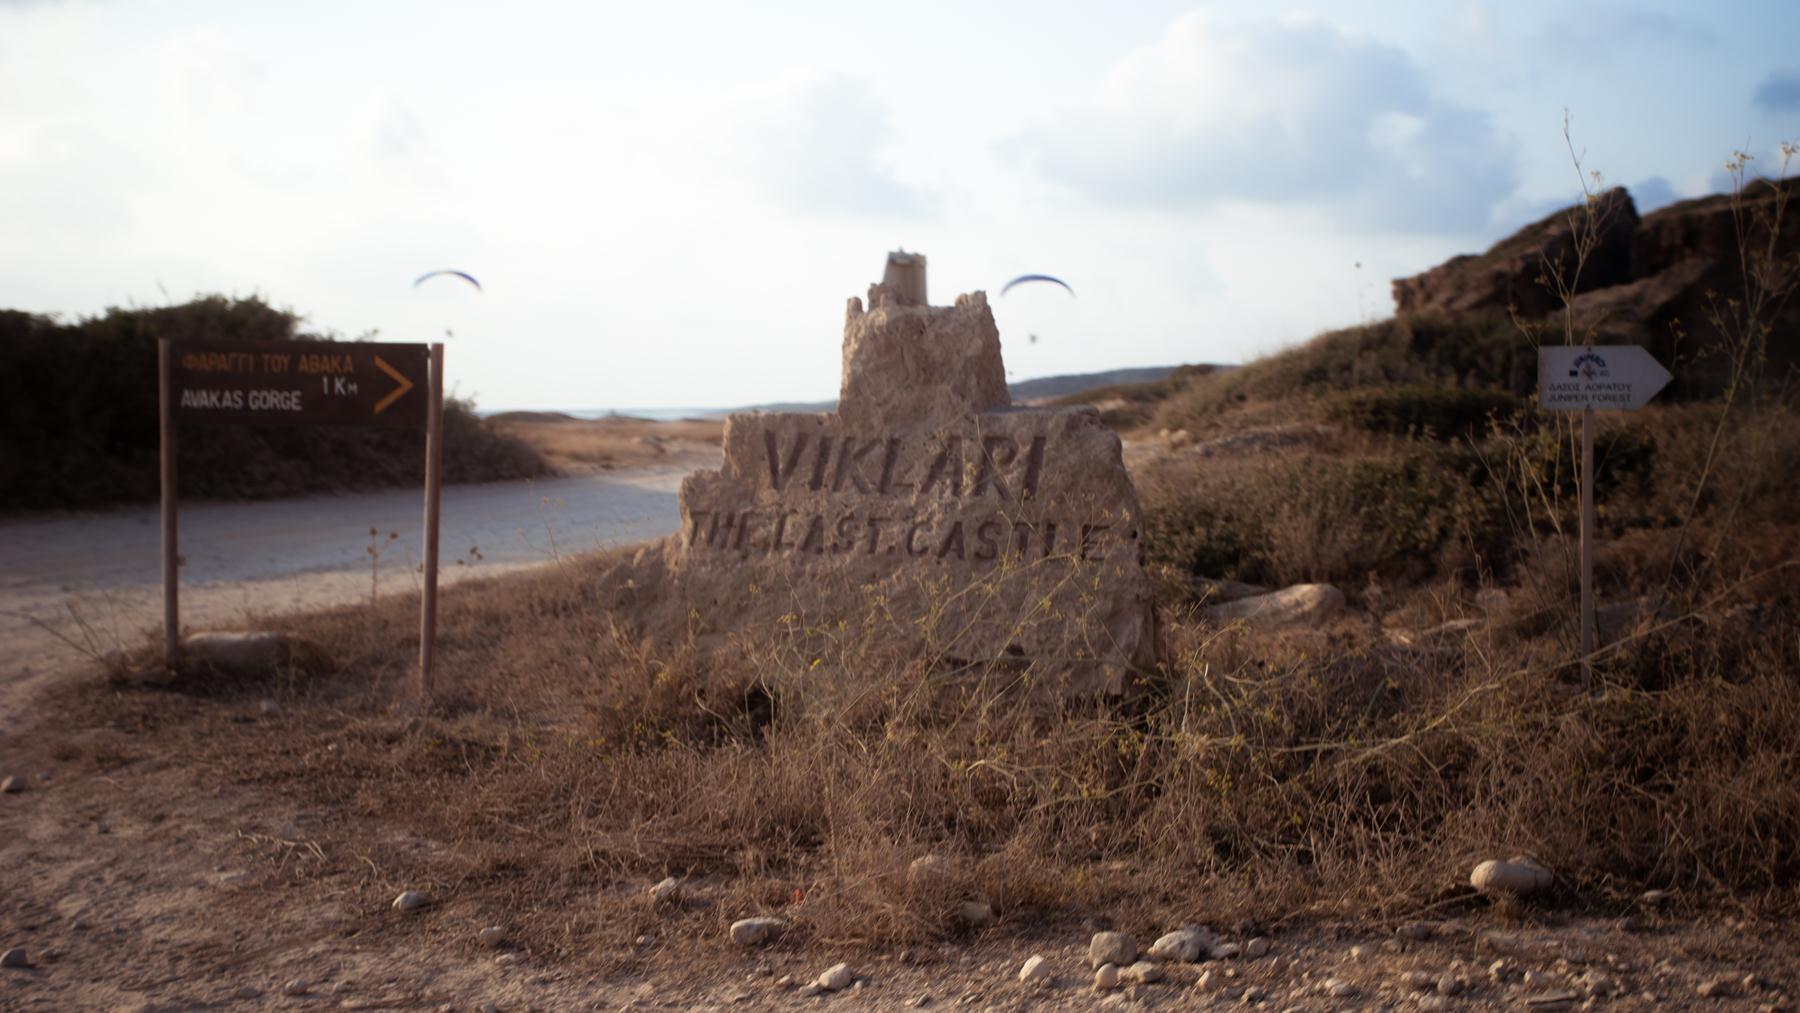 Поворот к кафе Viklari The Last Castle